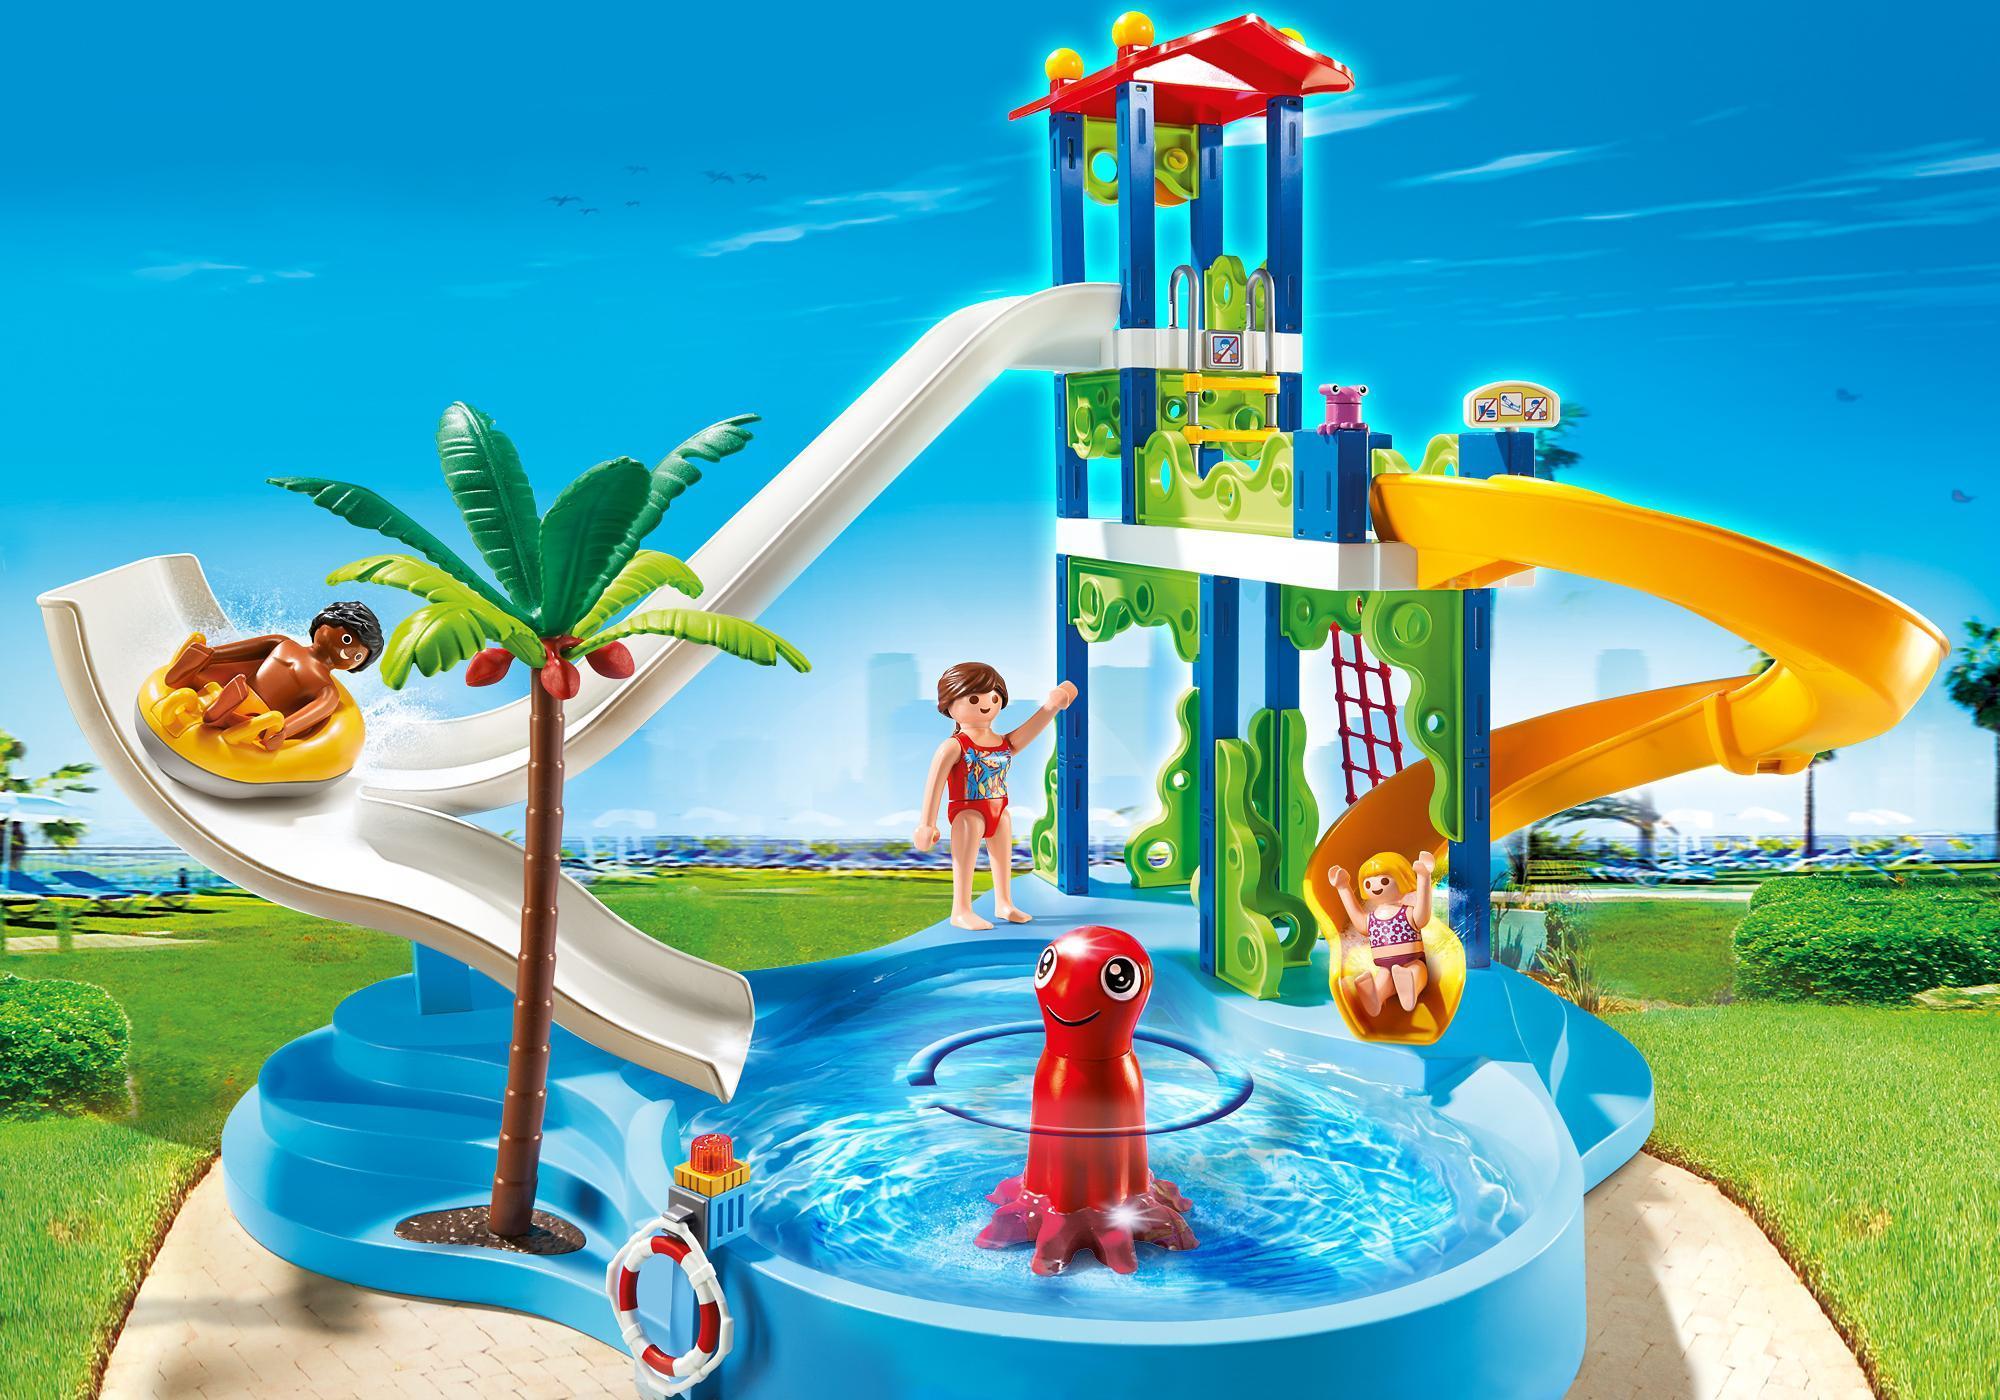 http://media.playmobil.com/i/playmobil/6669_product_detail/Aquapark mit Rutschentower